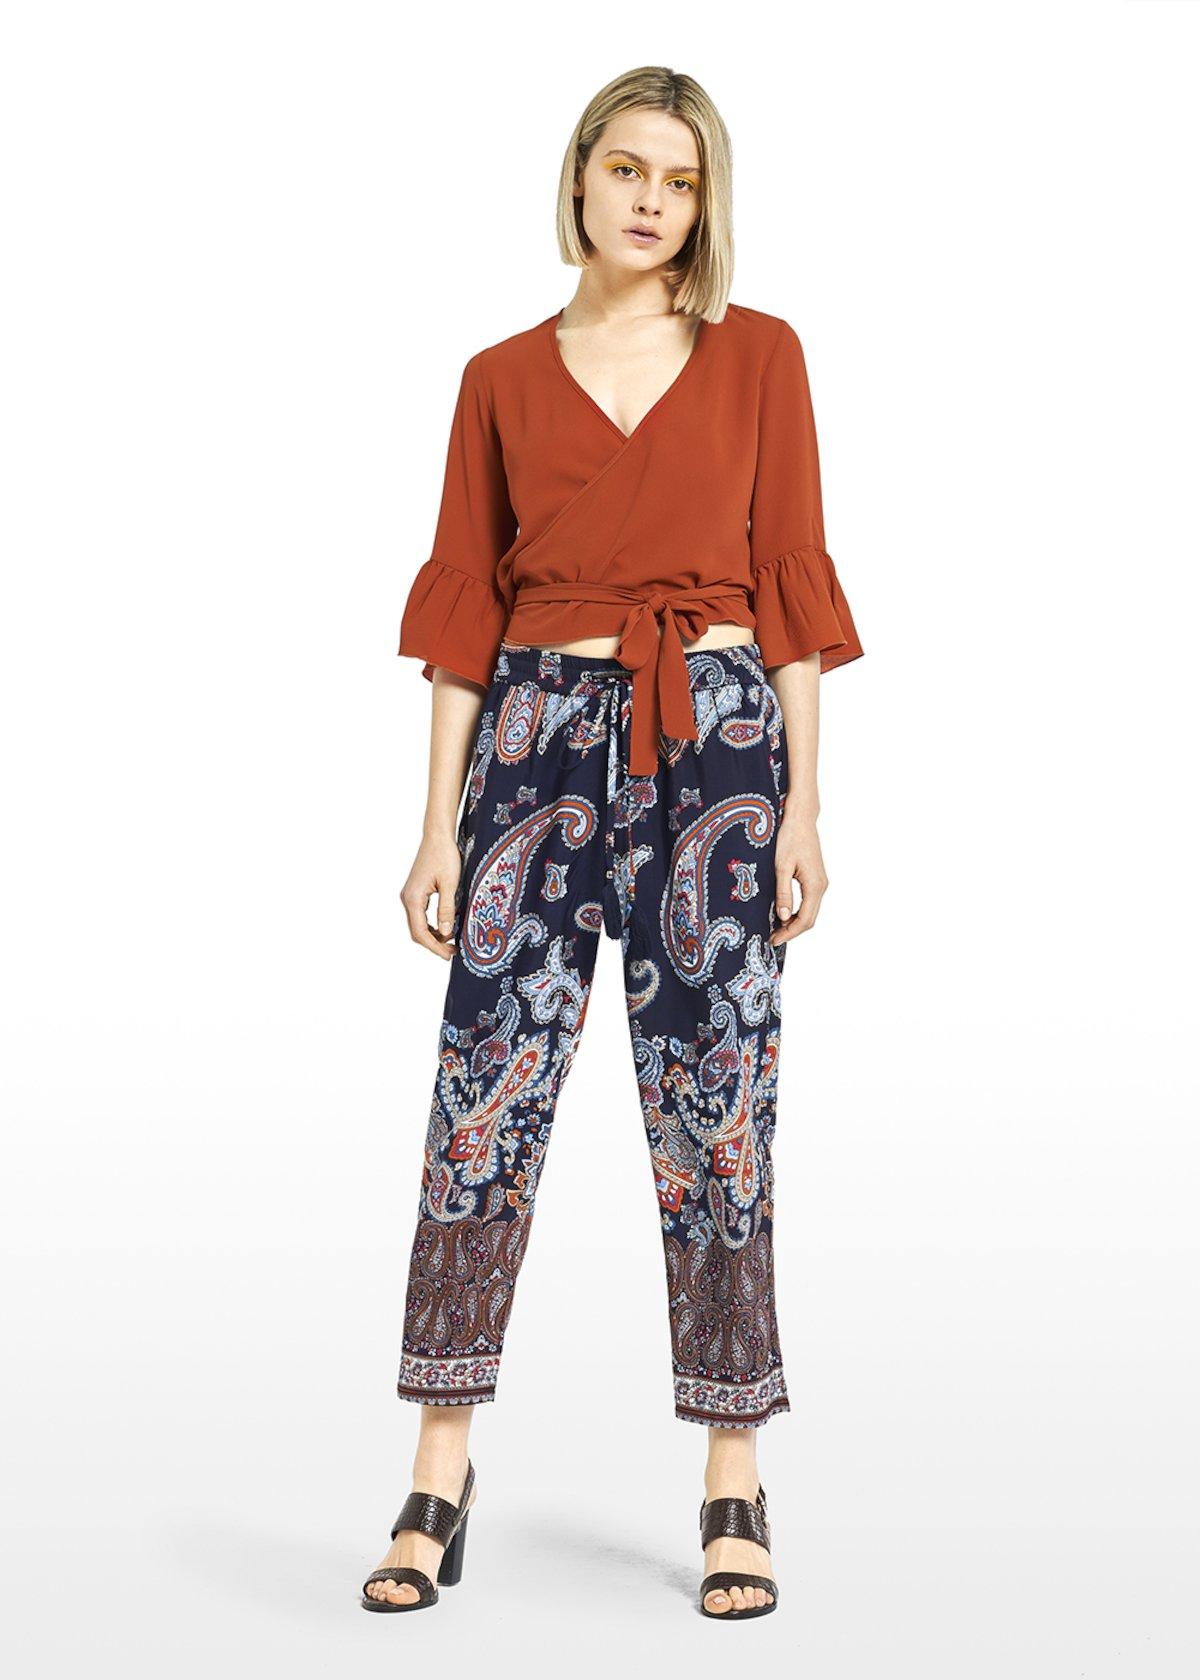 Timon T-shirt in a simil satin fabric with ruffles - Carota - Woman